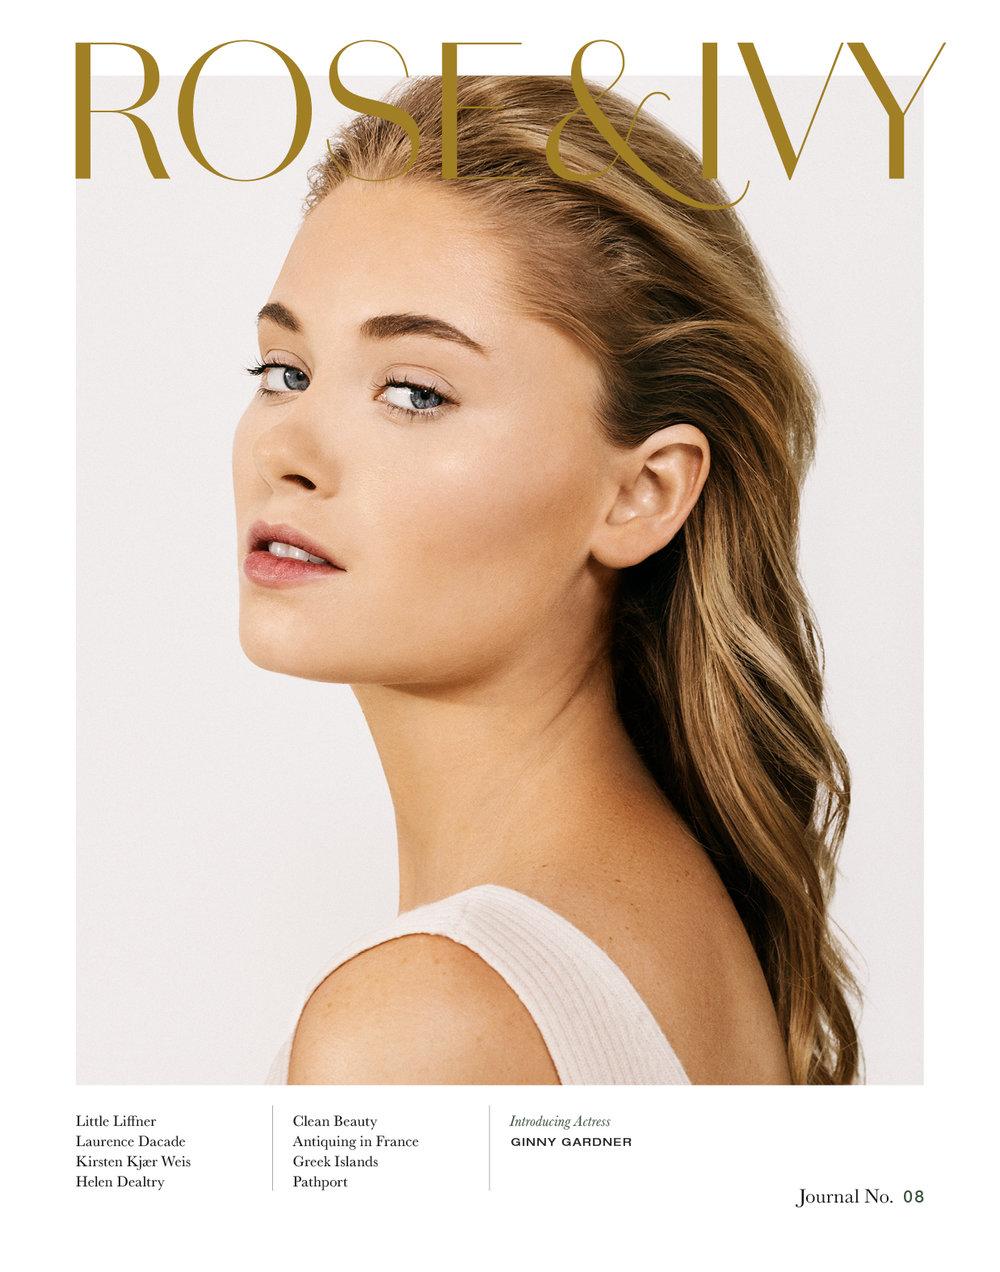 08 R&I 2017 Web Cover 9.24.17.jpg